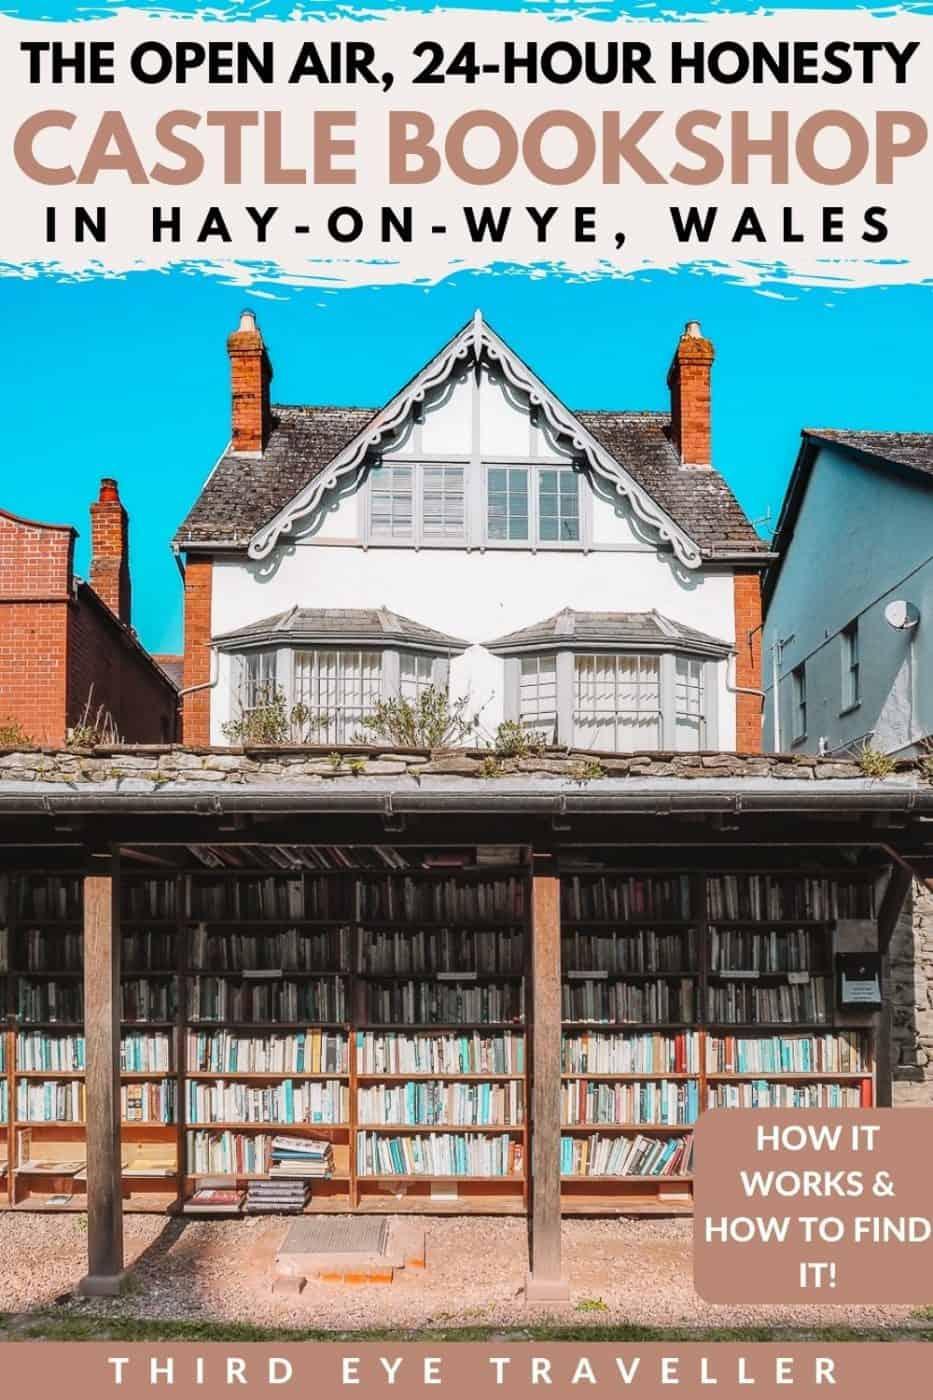 hay castle honesty bookshop hay on wye